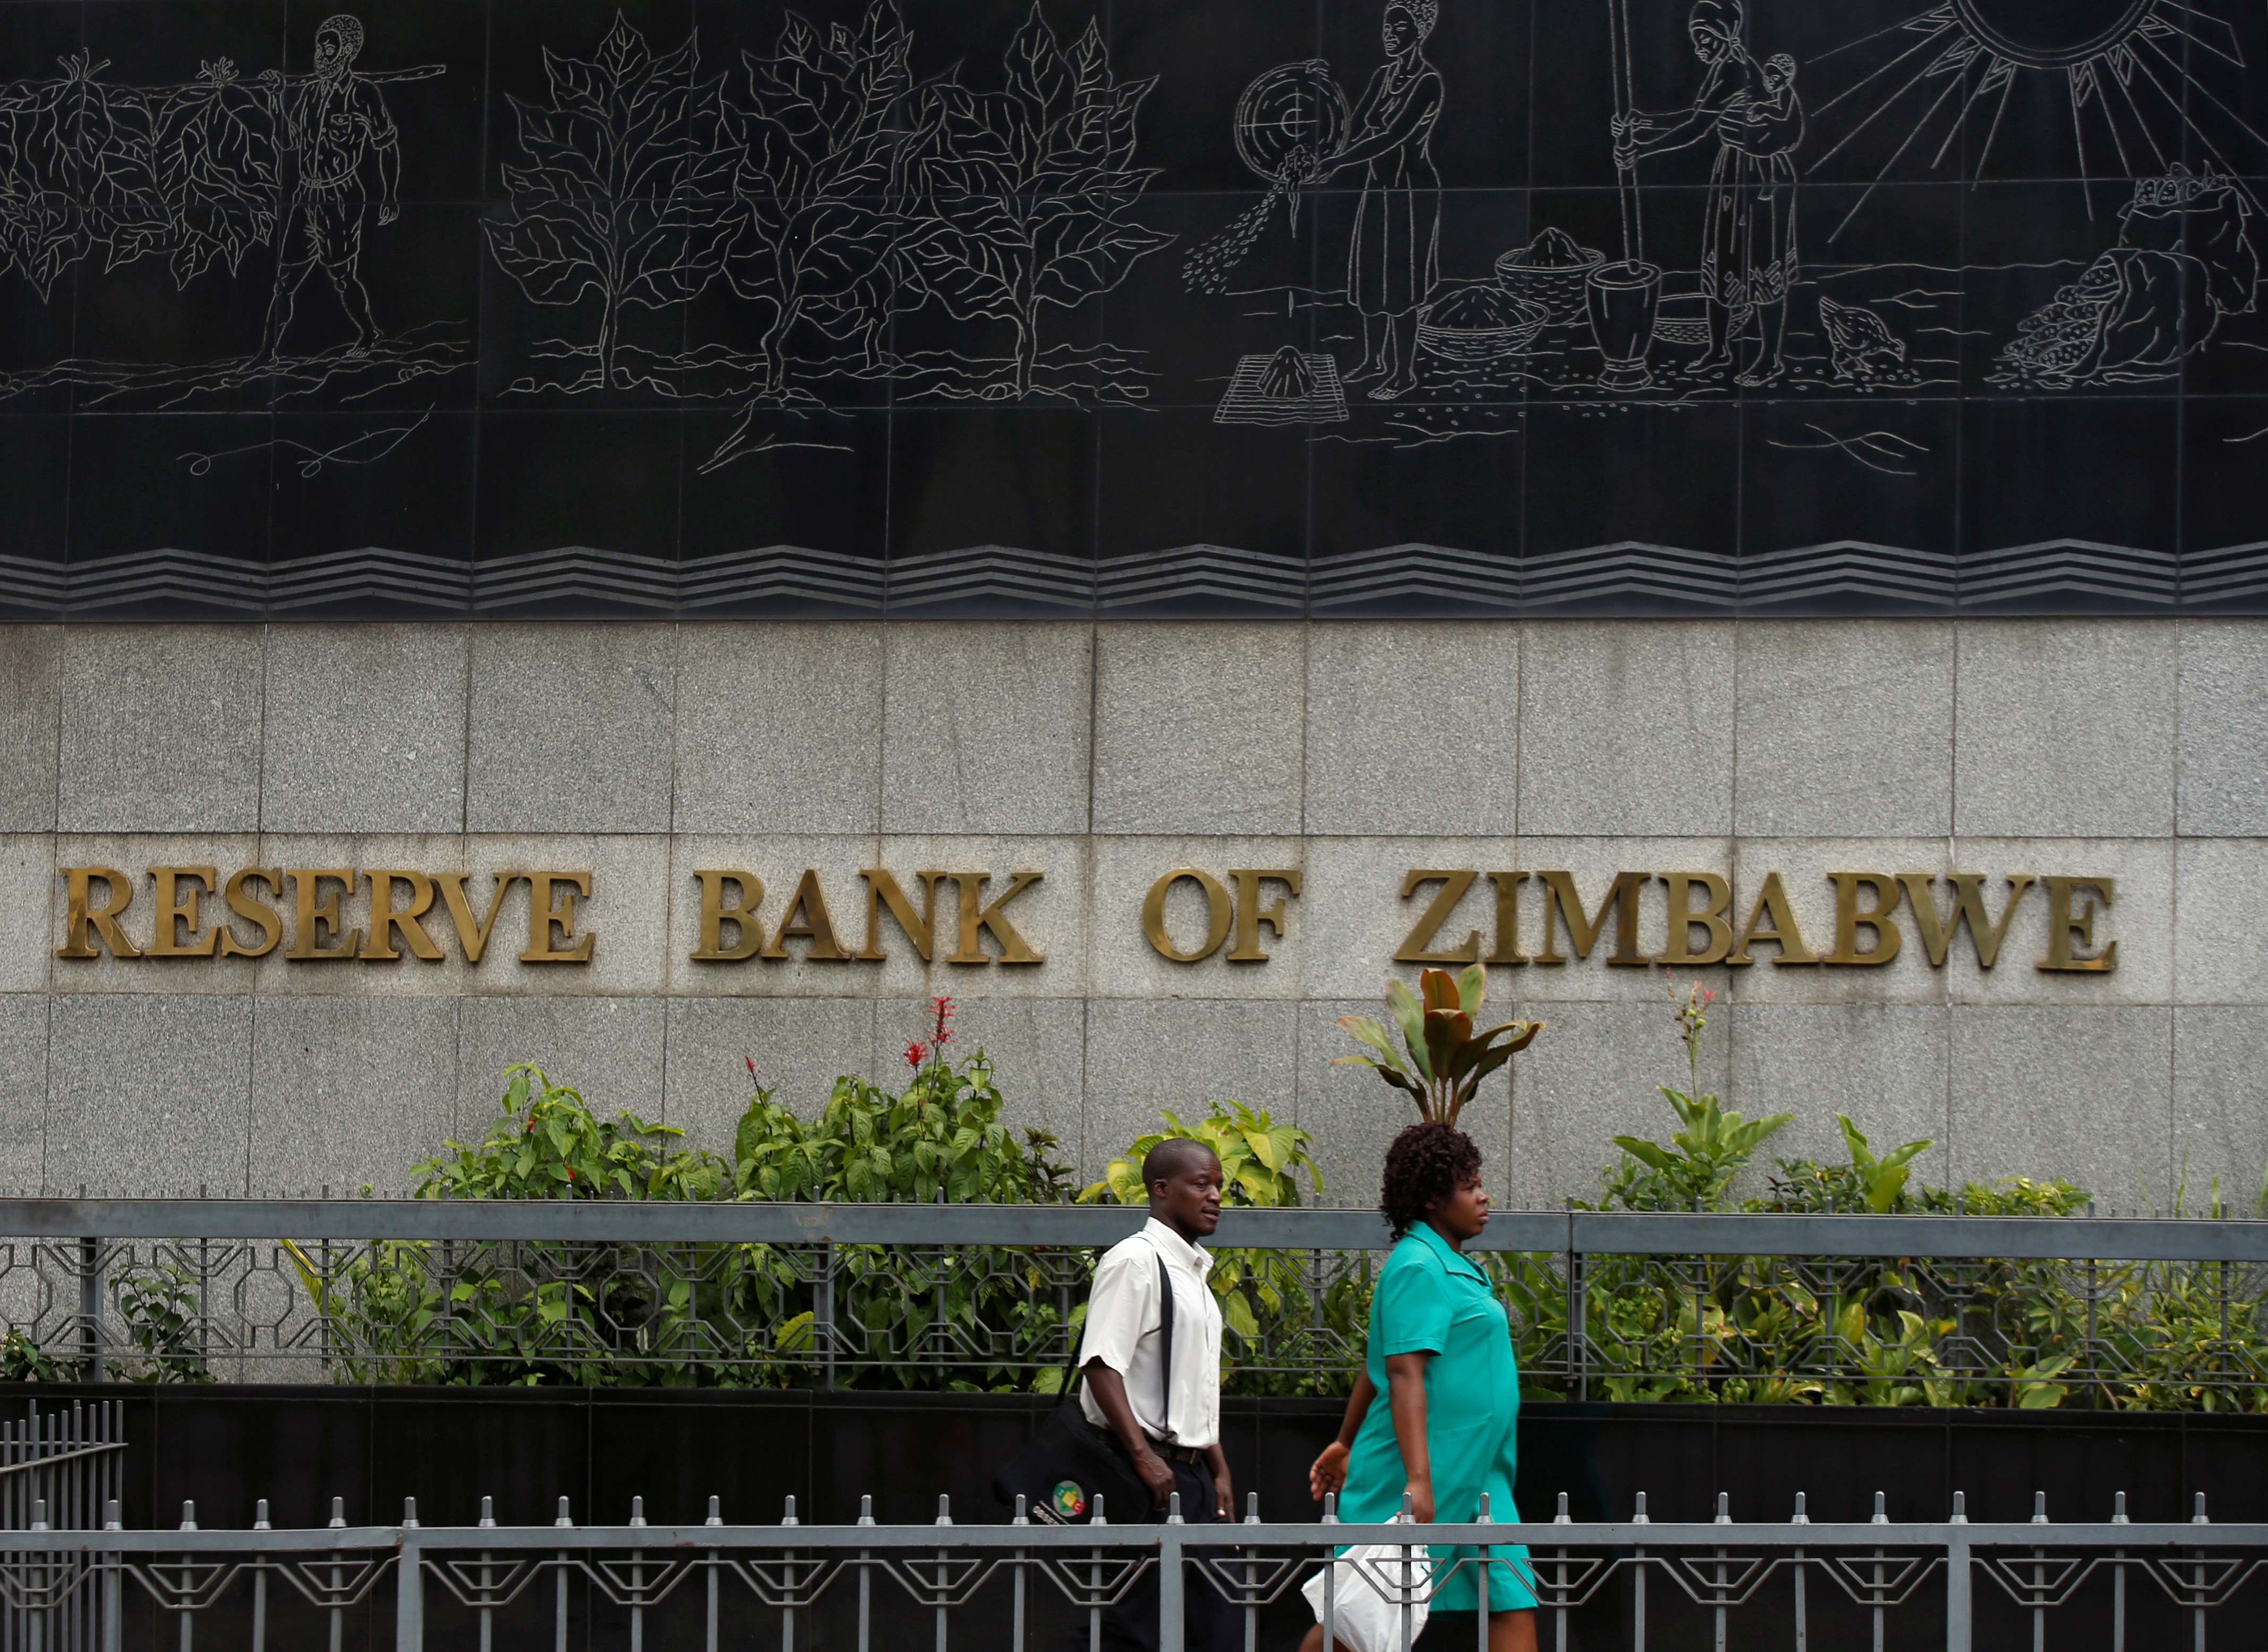 People walk past the Reserve Bank of Zimbabwe building in Harare, Zimbabwe, February 25, 2019. REUTERS/Philimon Bulawayo